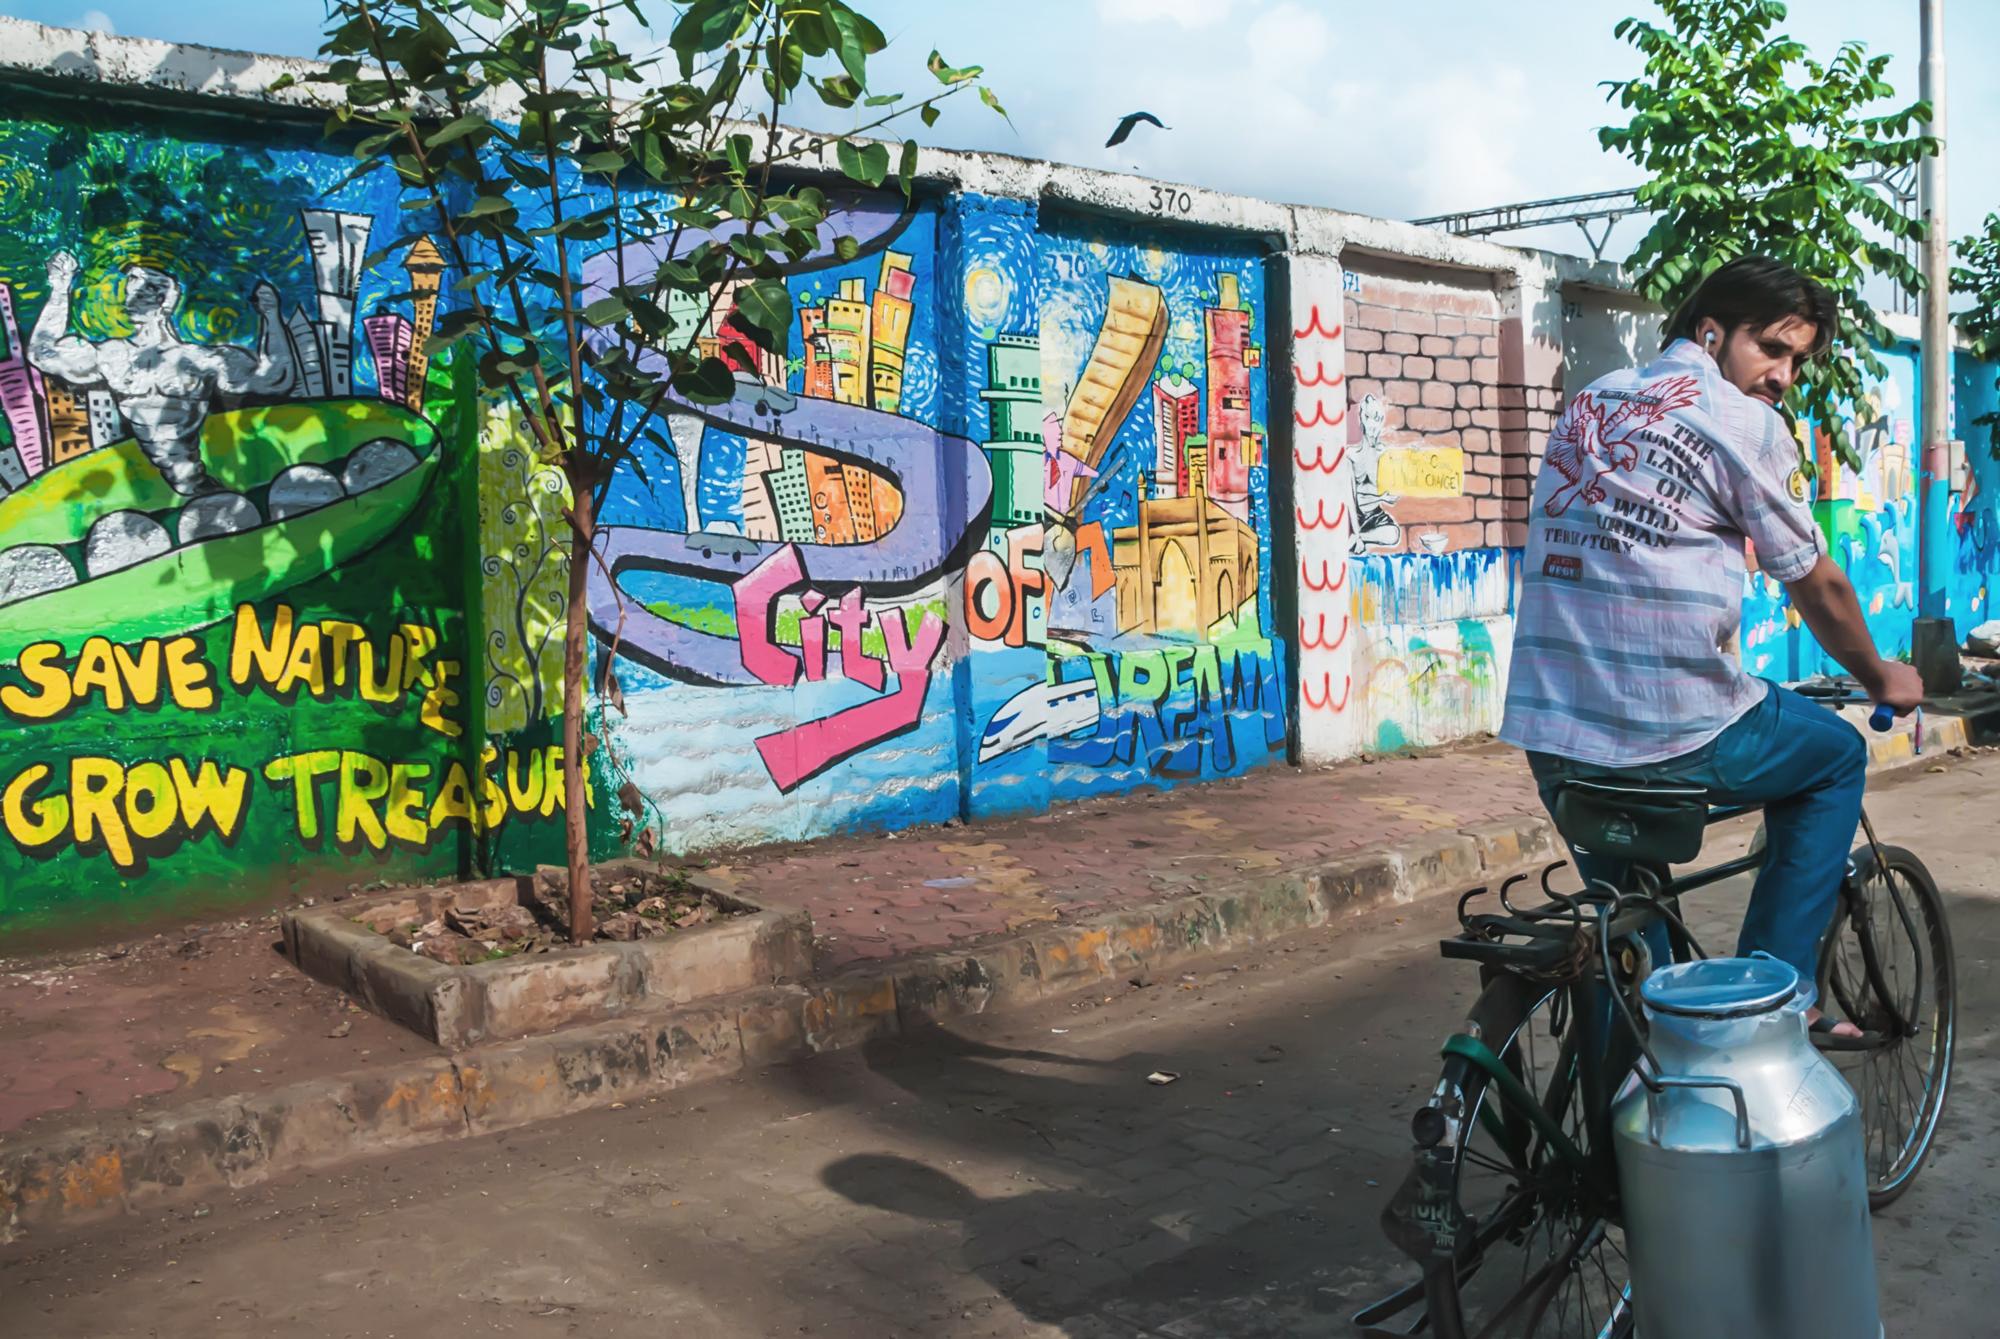 & The Mumbai Wall Project Street Art in India